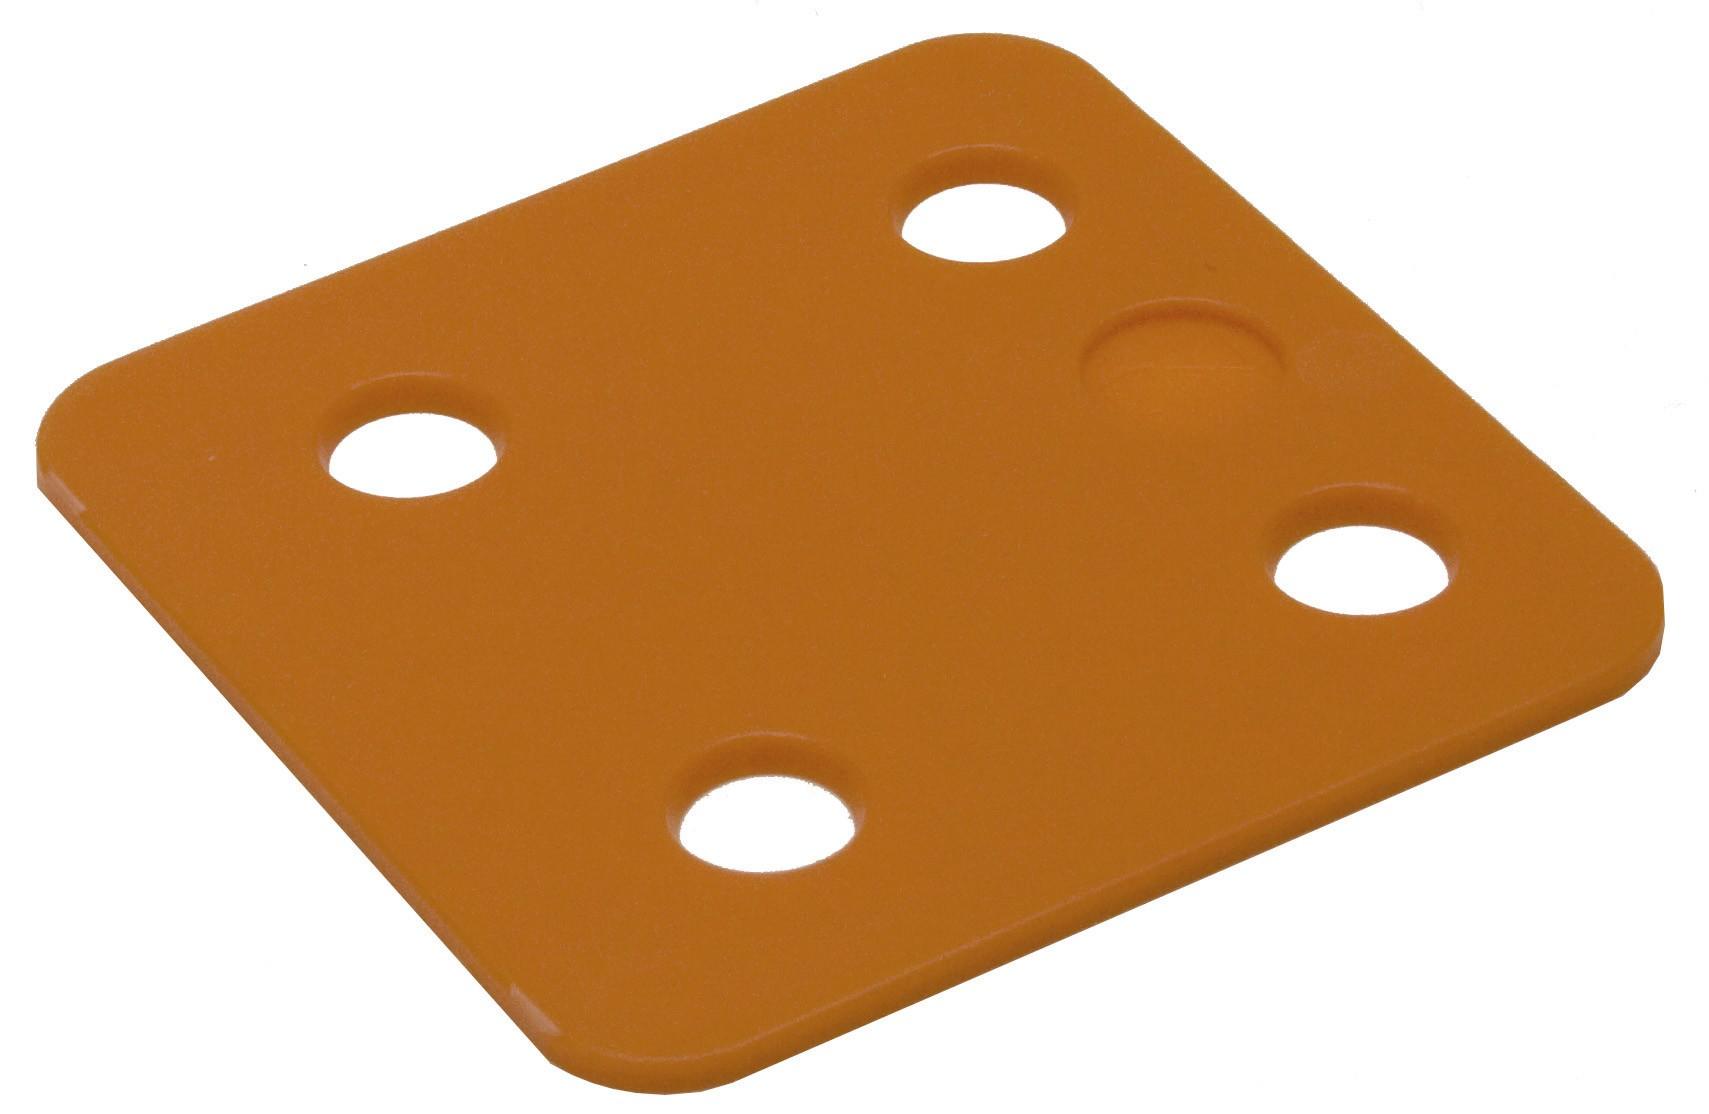 Drukplaat zonder sleuf oranje 2 70x70 KS